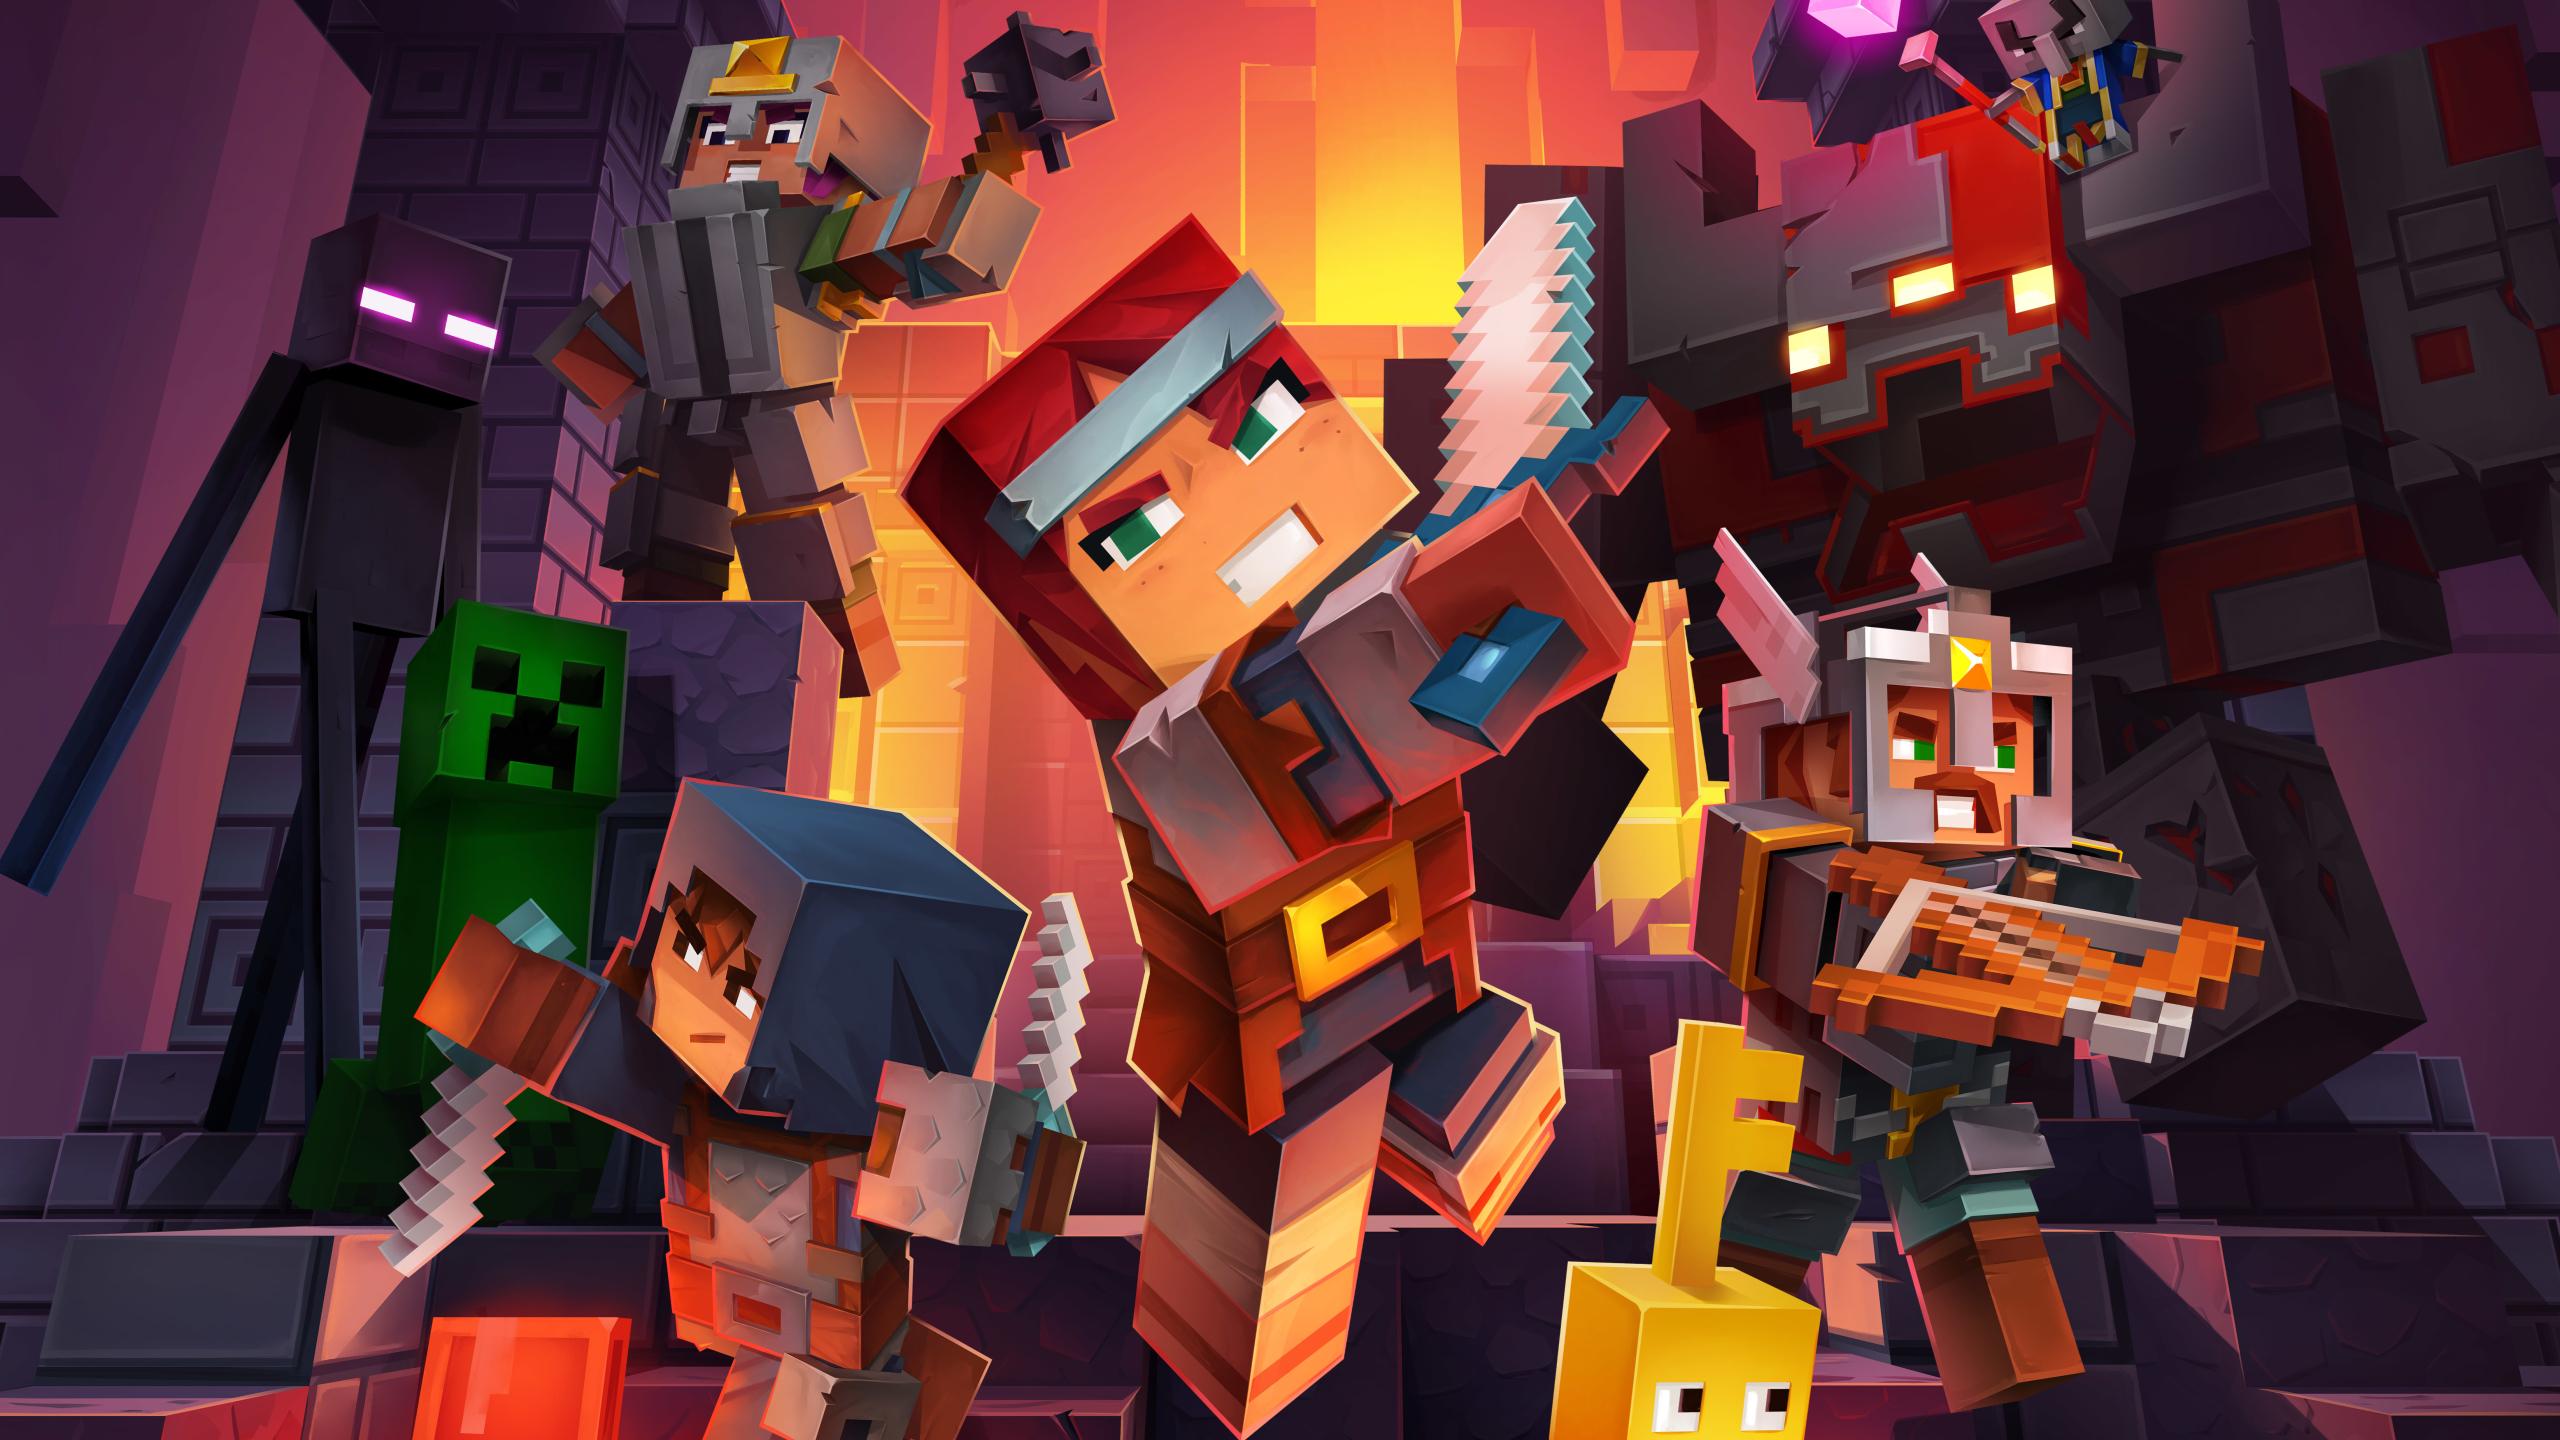 2560x1440 Minecraft Dungeons 1440p Resolution Wallpaper Hd Games